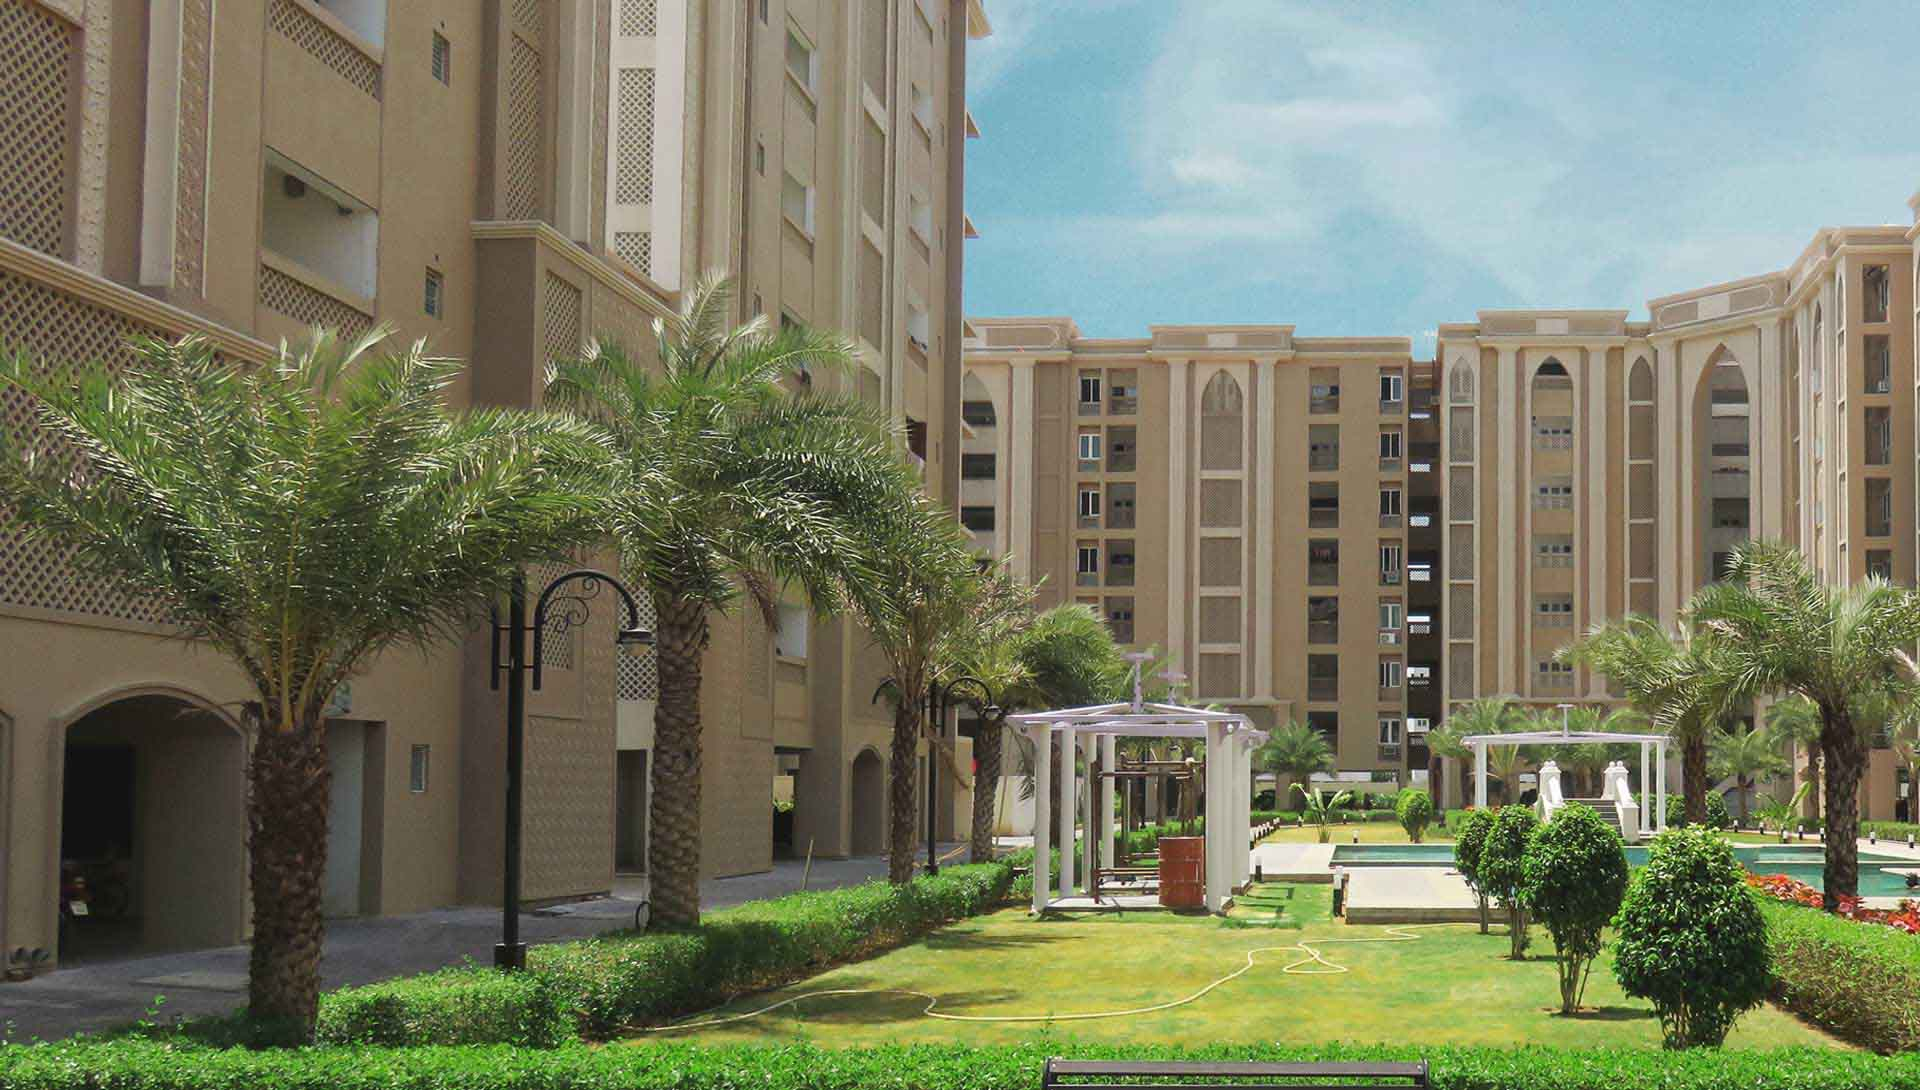 S.I.S Marakesh Urappakkam Chennai 7863